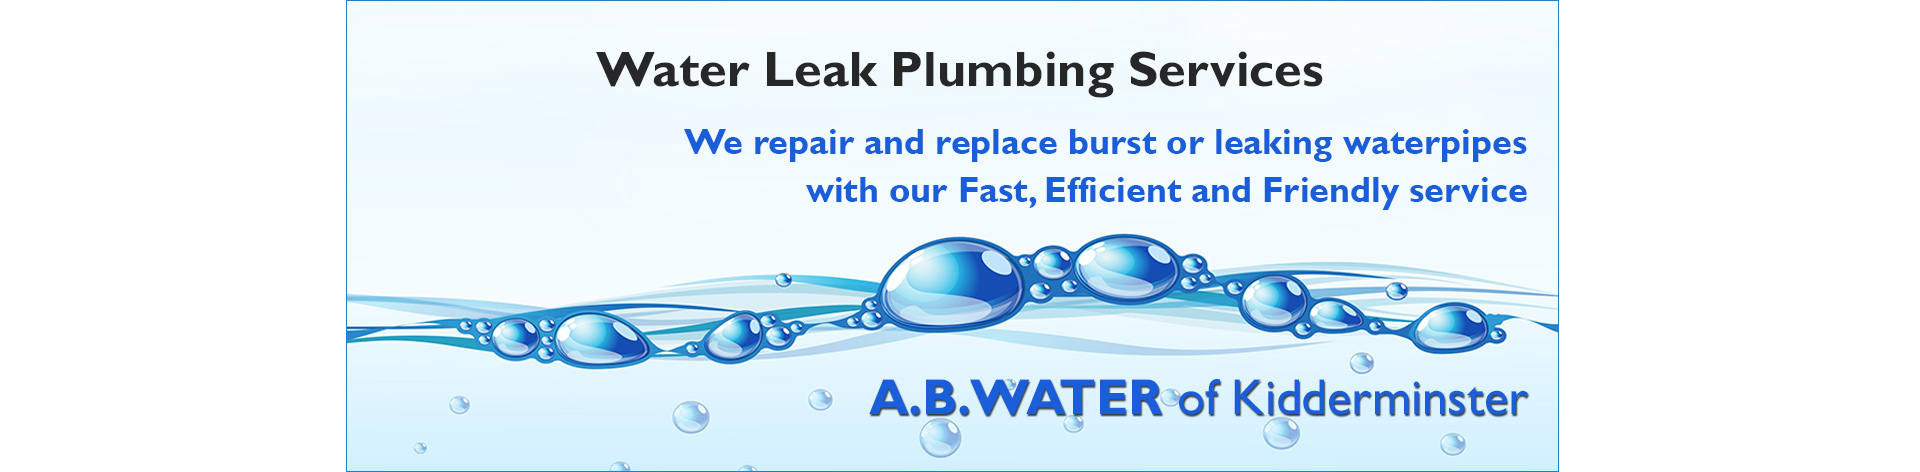 water-leak-plumbing-service-worcestershire